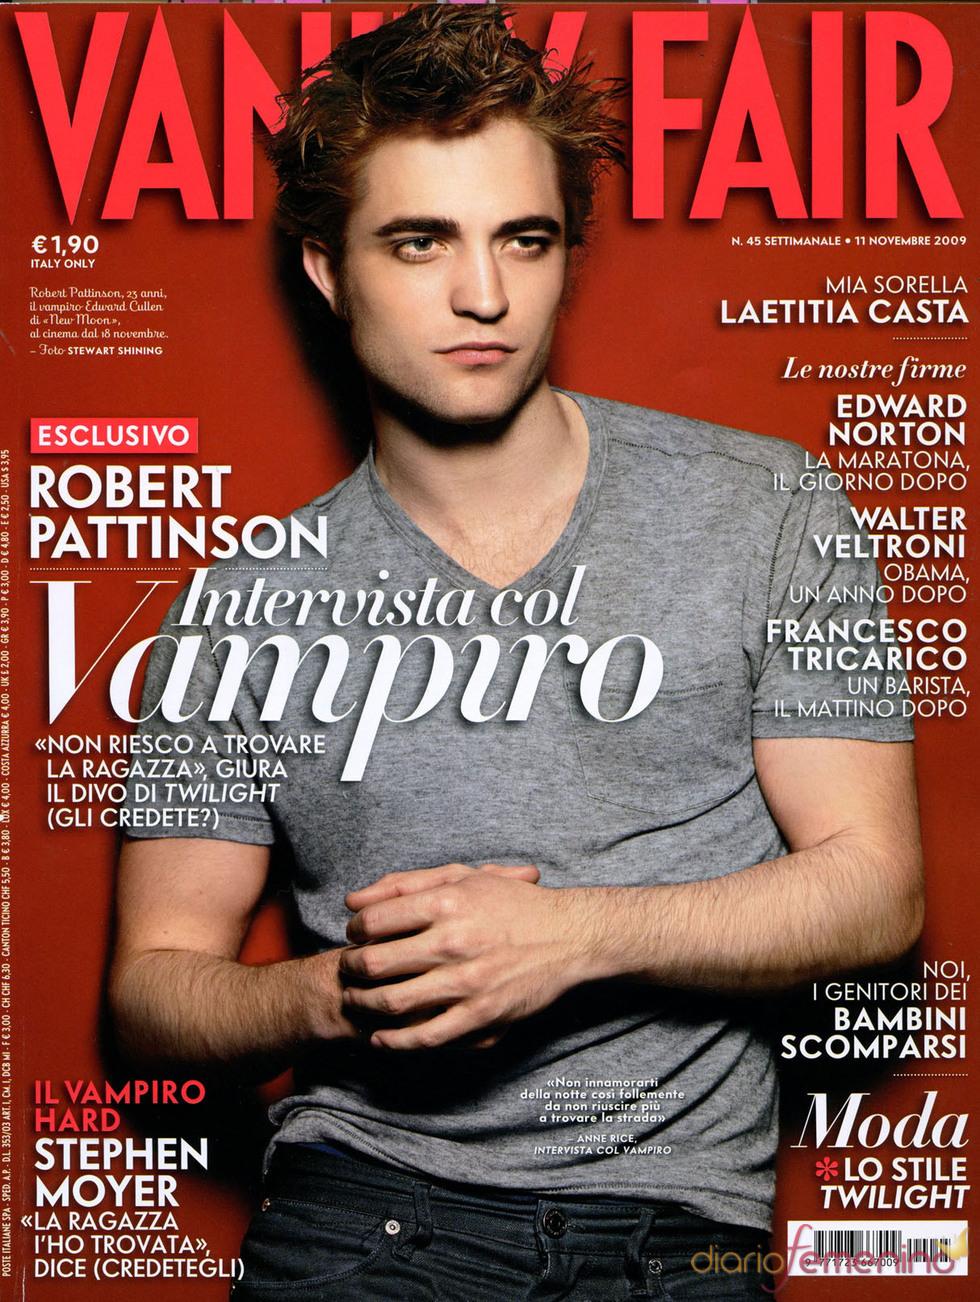 Robert Pattinson, portada de 'Vanity Fair'